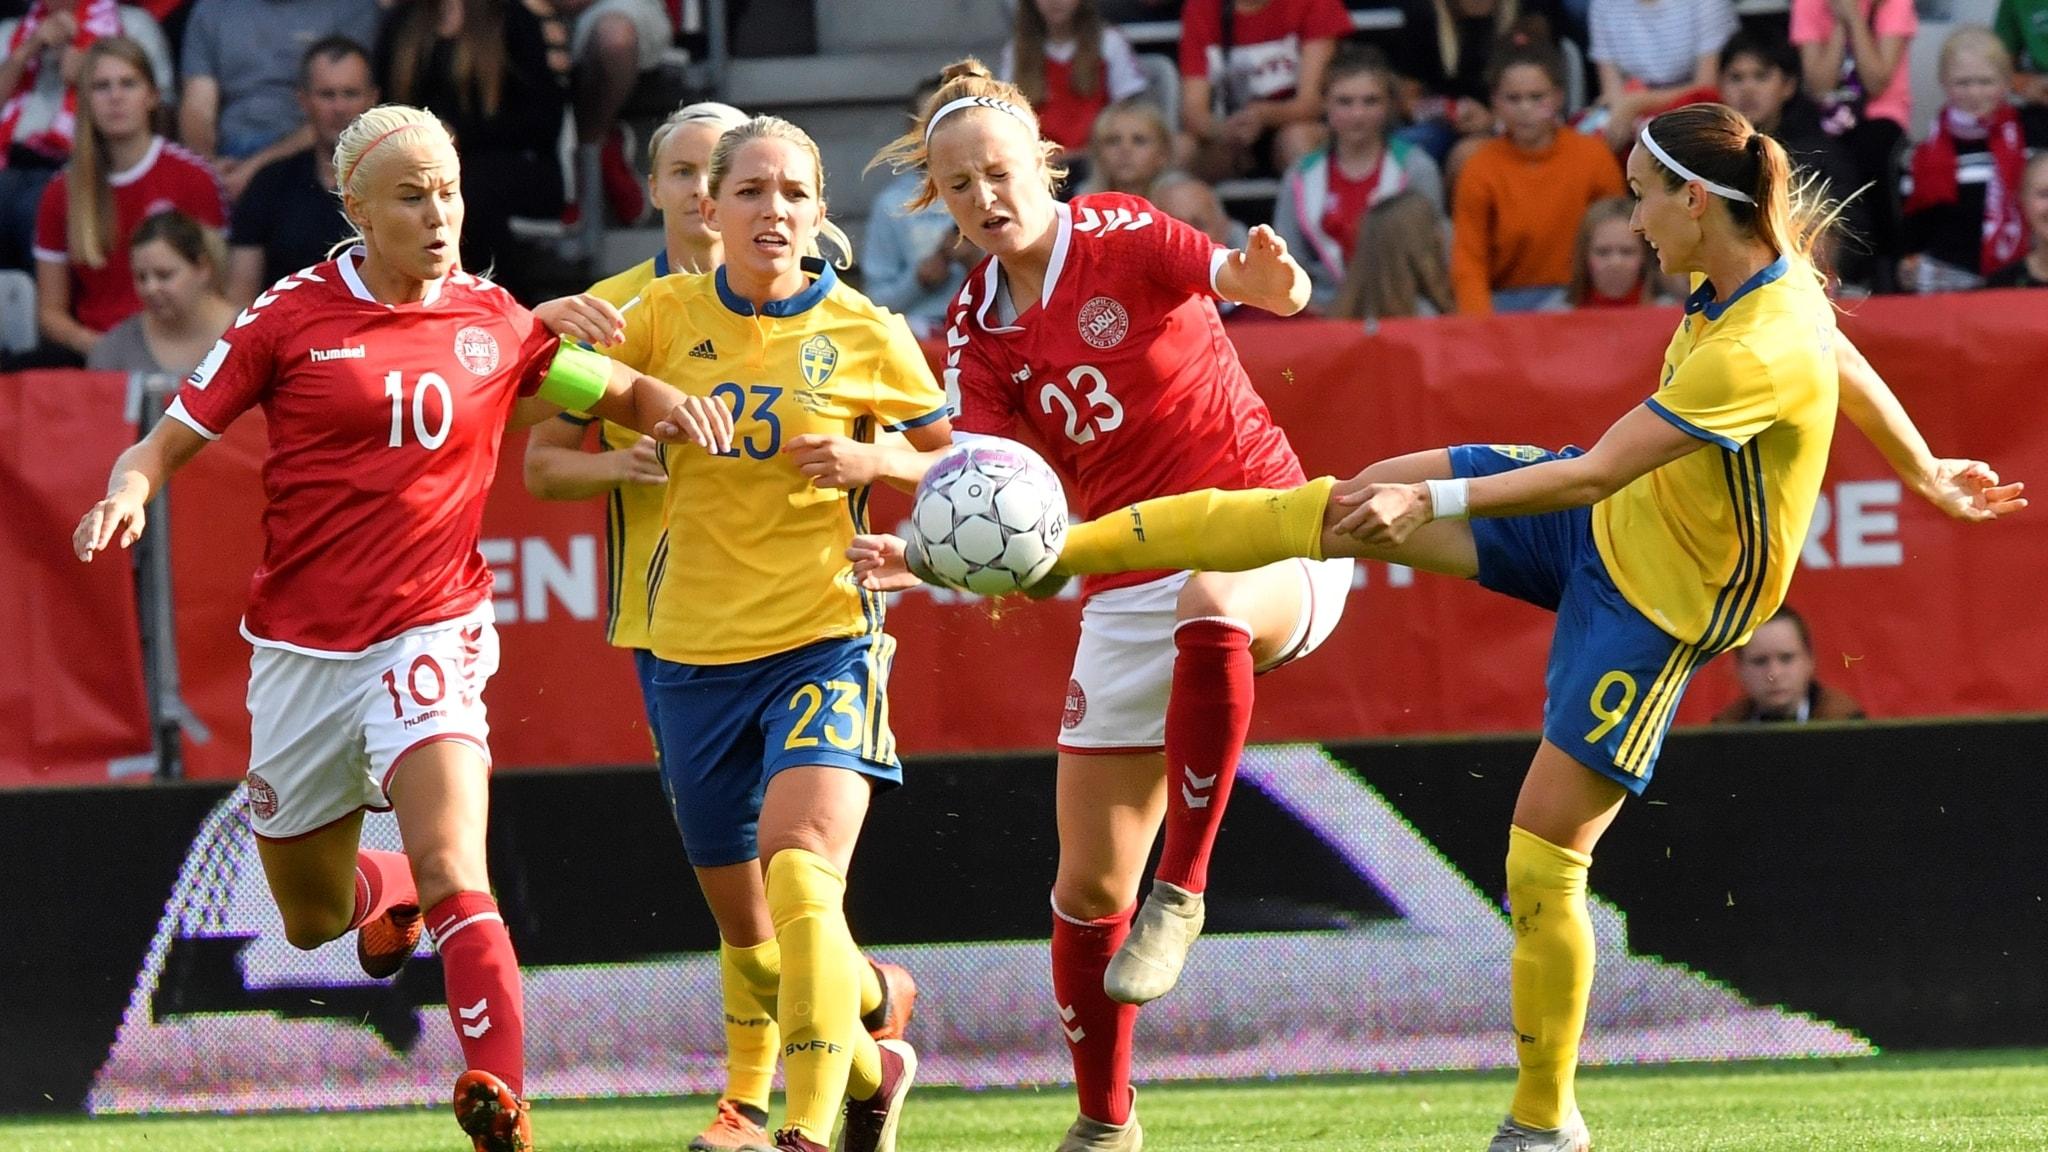 Svenska vm laget nast aldst i kvalet 3